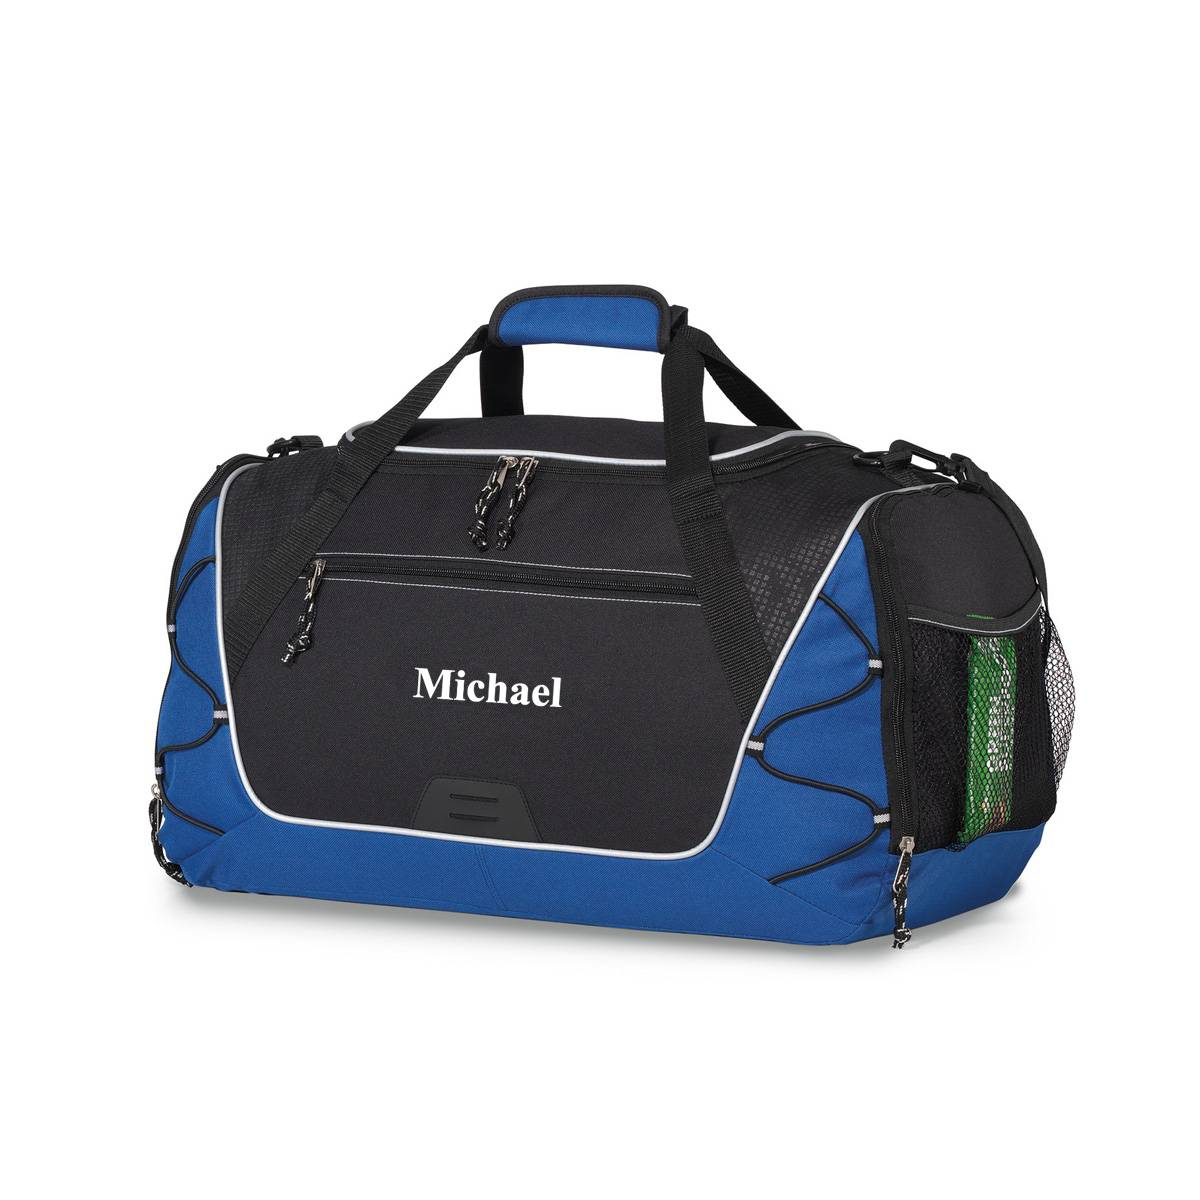 JDS Marketing & Sales Personalized Sports Duffel Bag